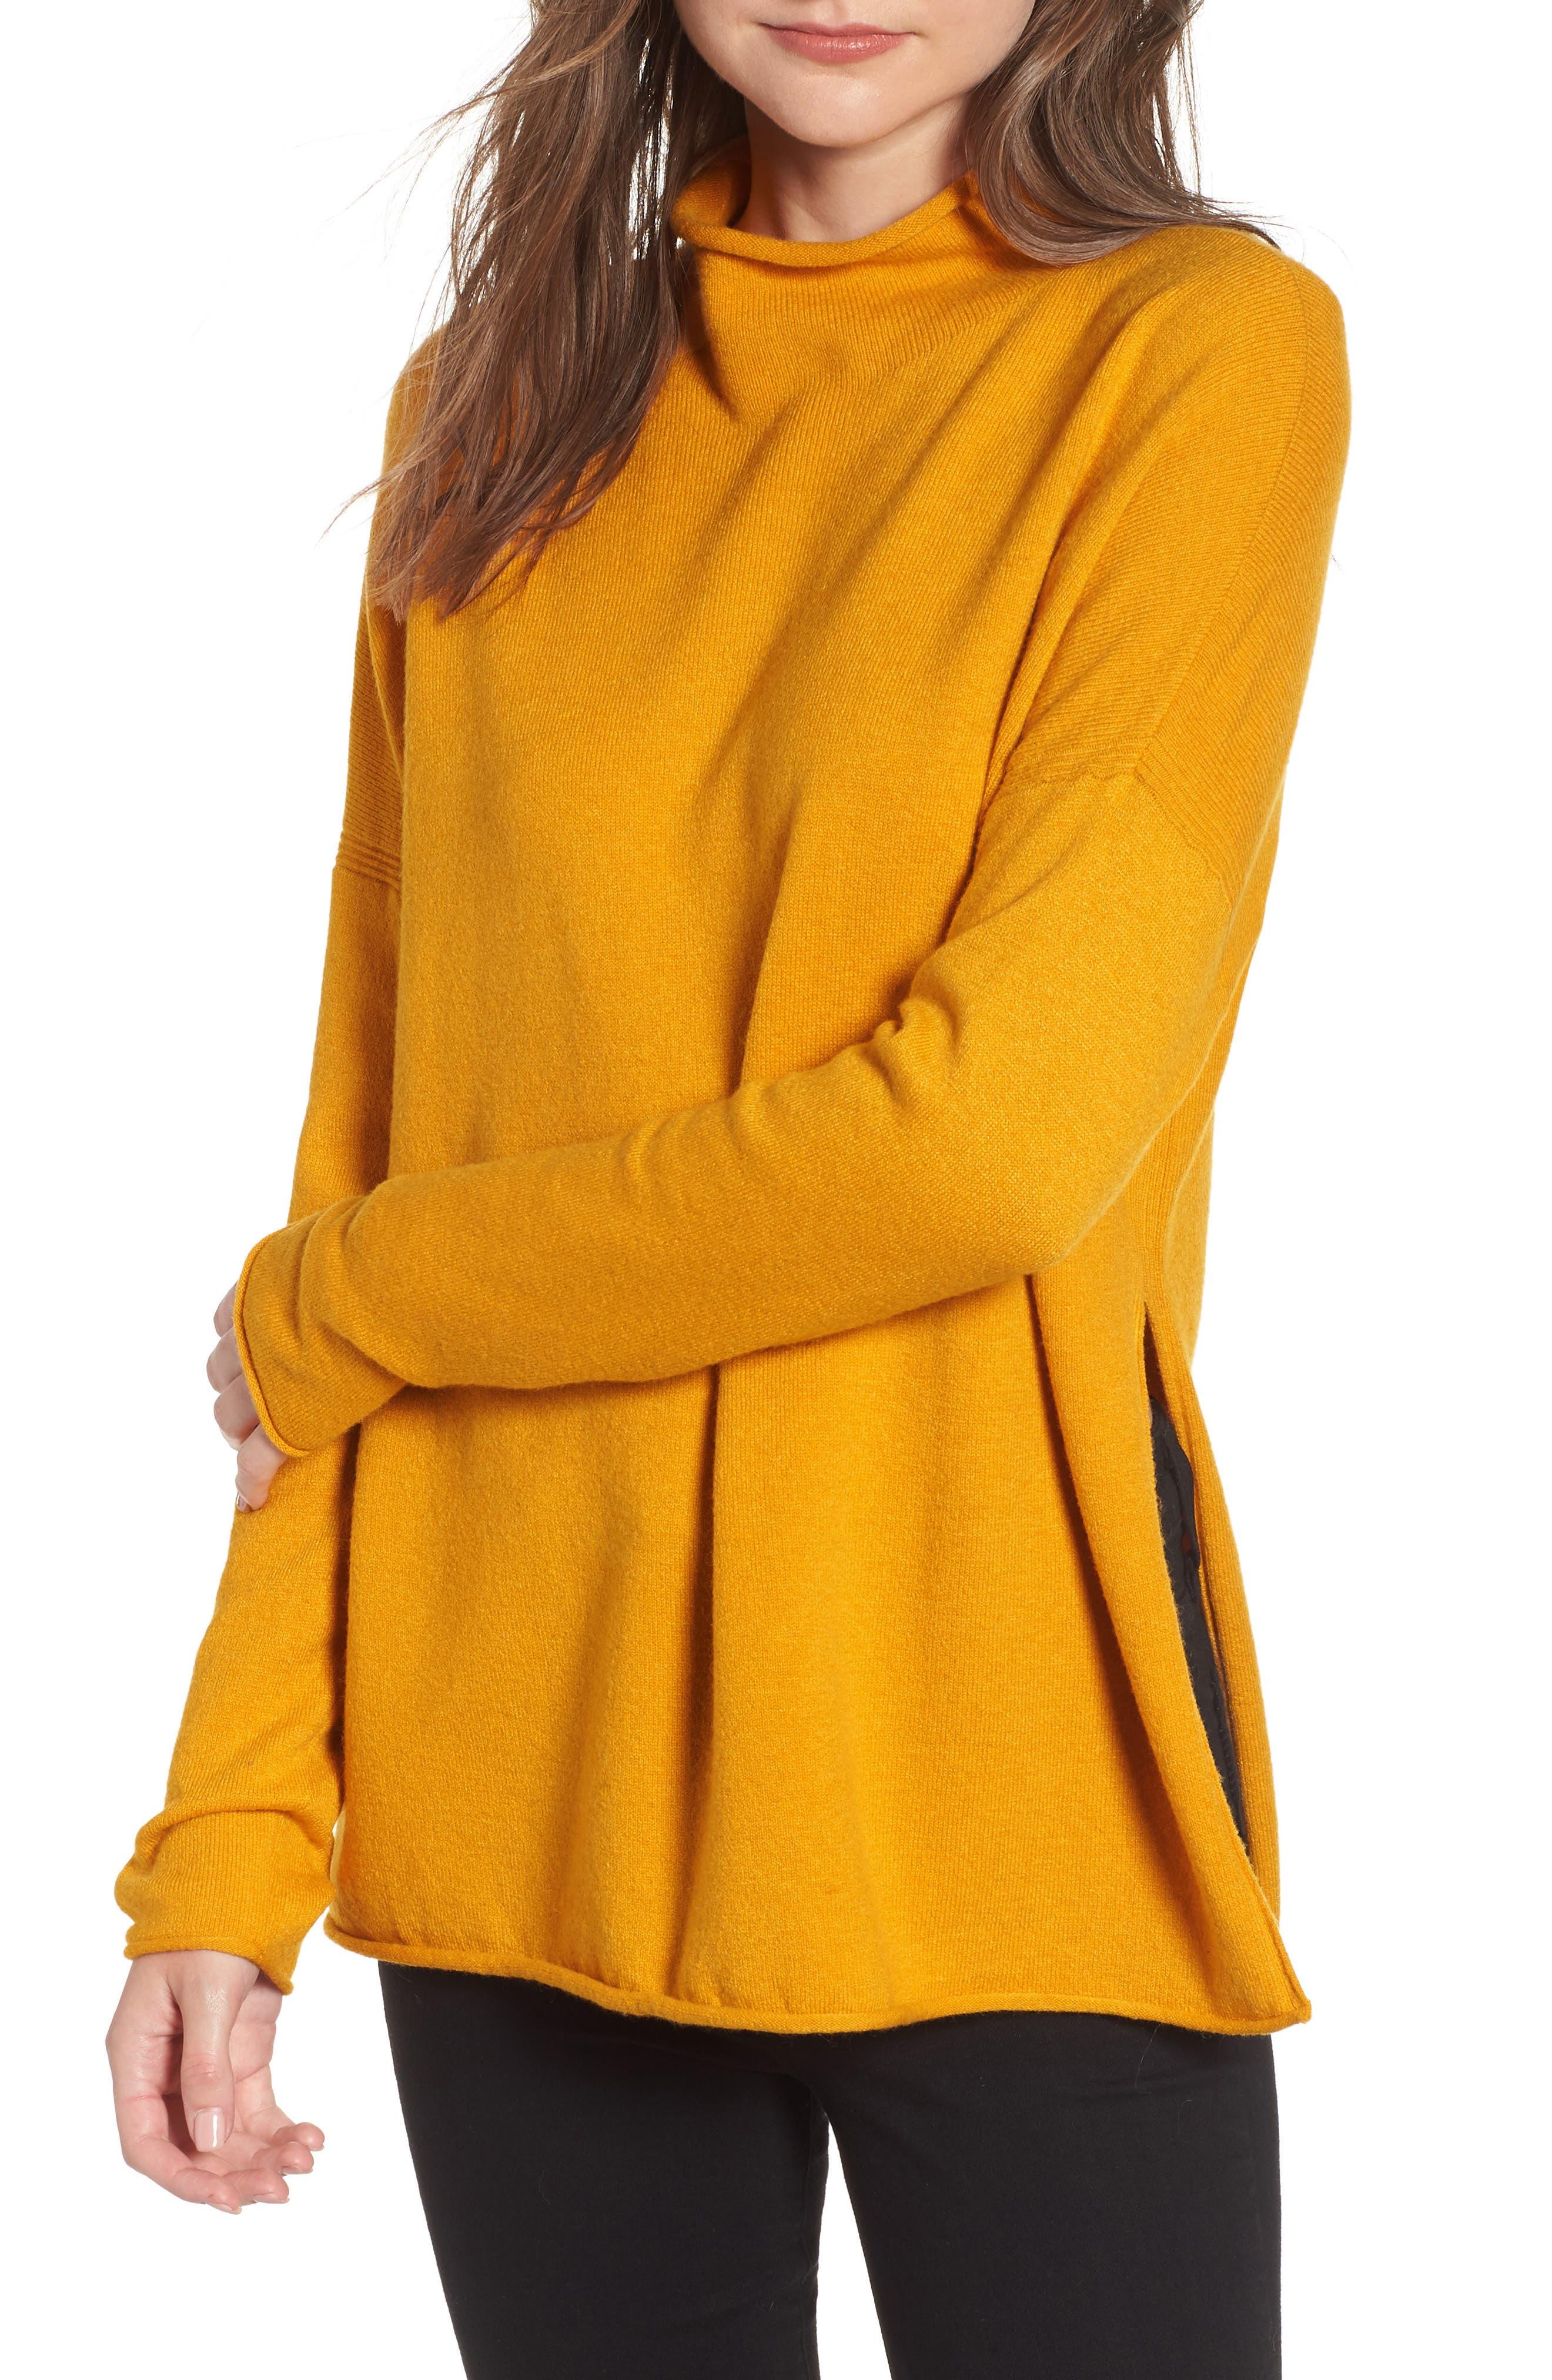 Ebba Sweater,                         Main,                         color, CALLUNA YELLOW